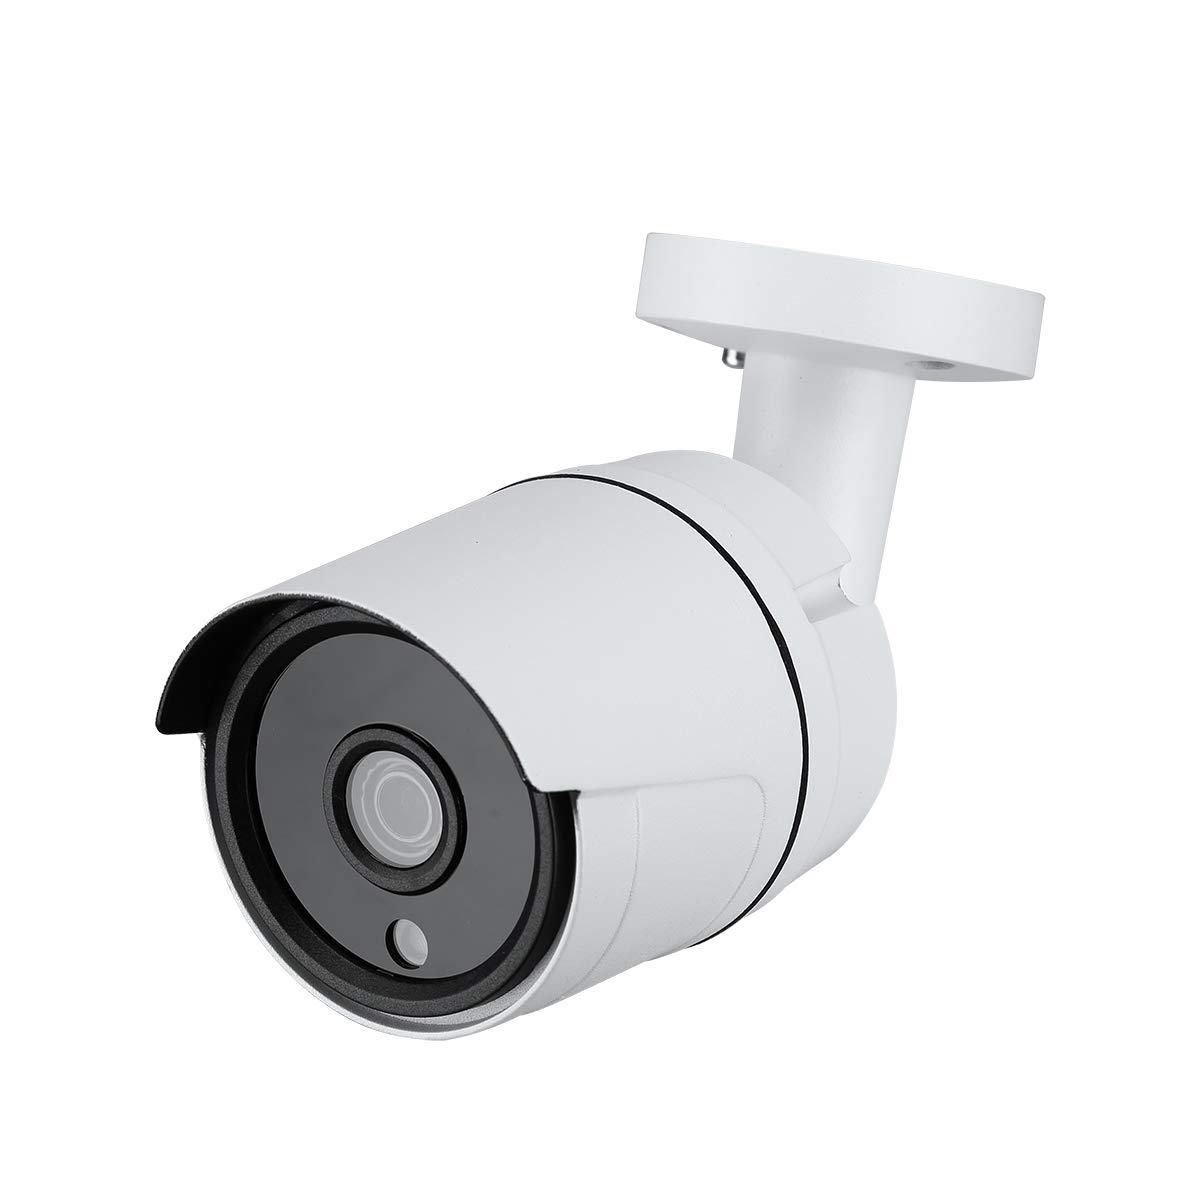 PoE IP-Kamera, 1,3 Megapixel 960P HD, PoE-Netzteil